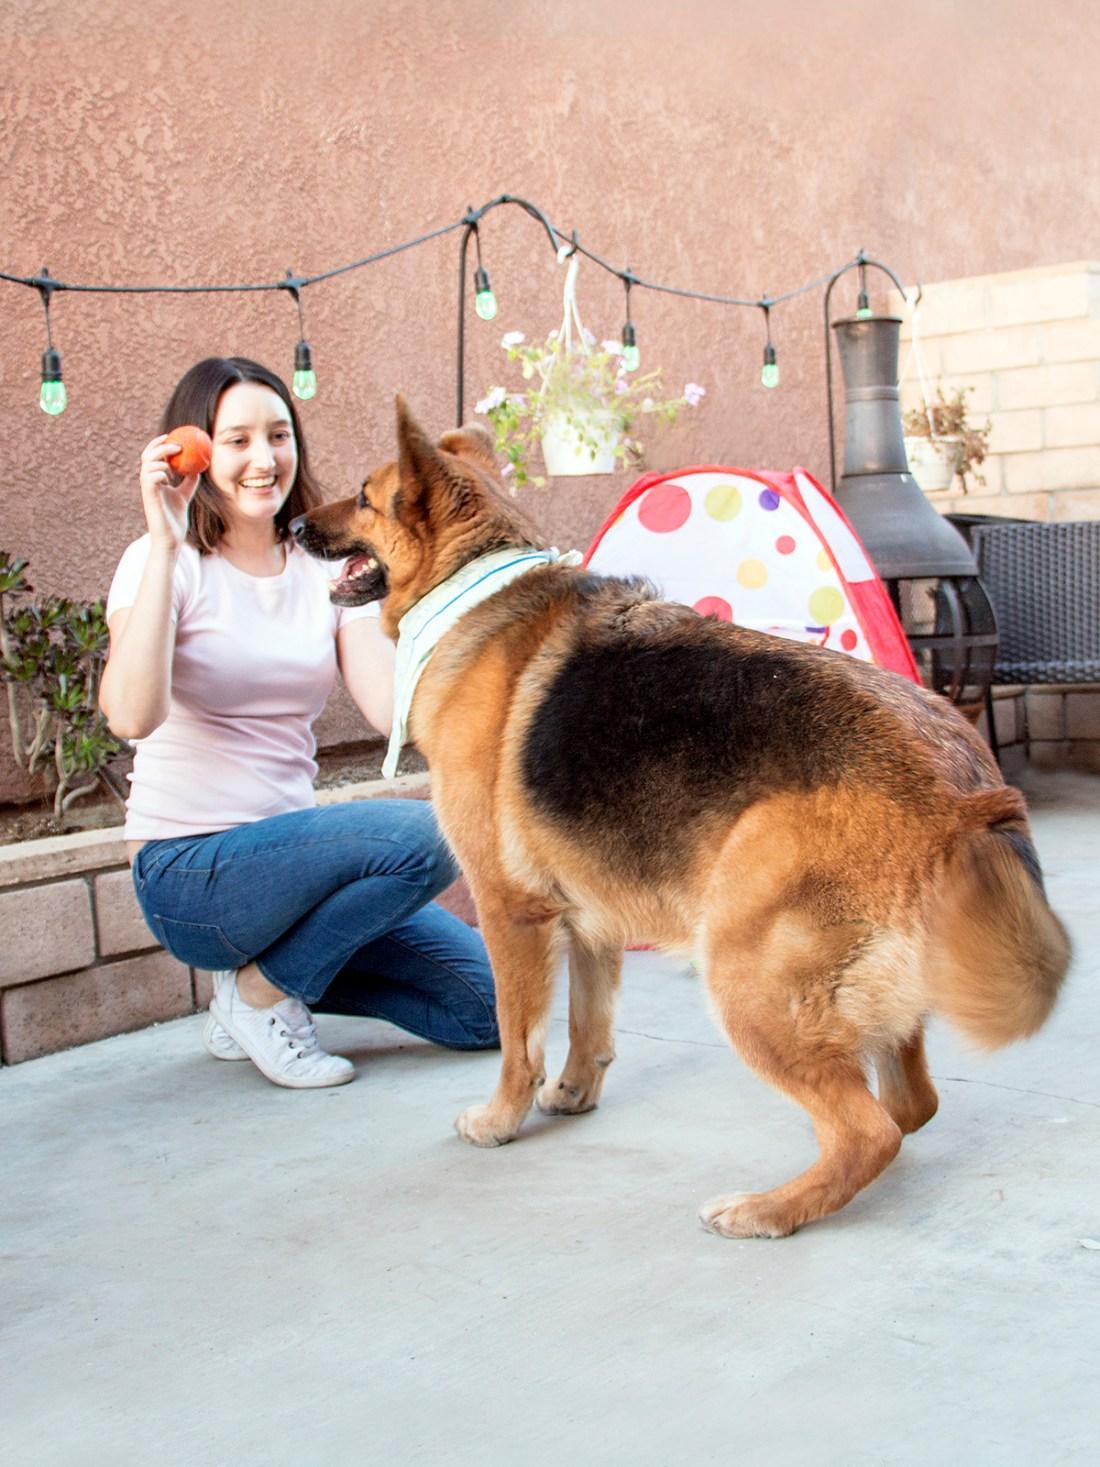 Bonding with German Shepherd Dog | A Good Hue